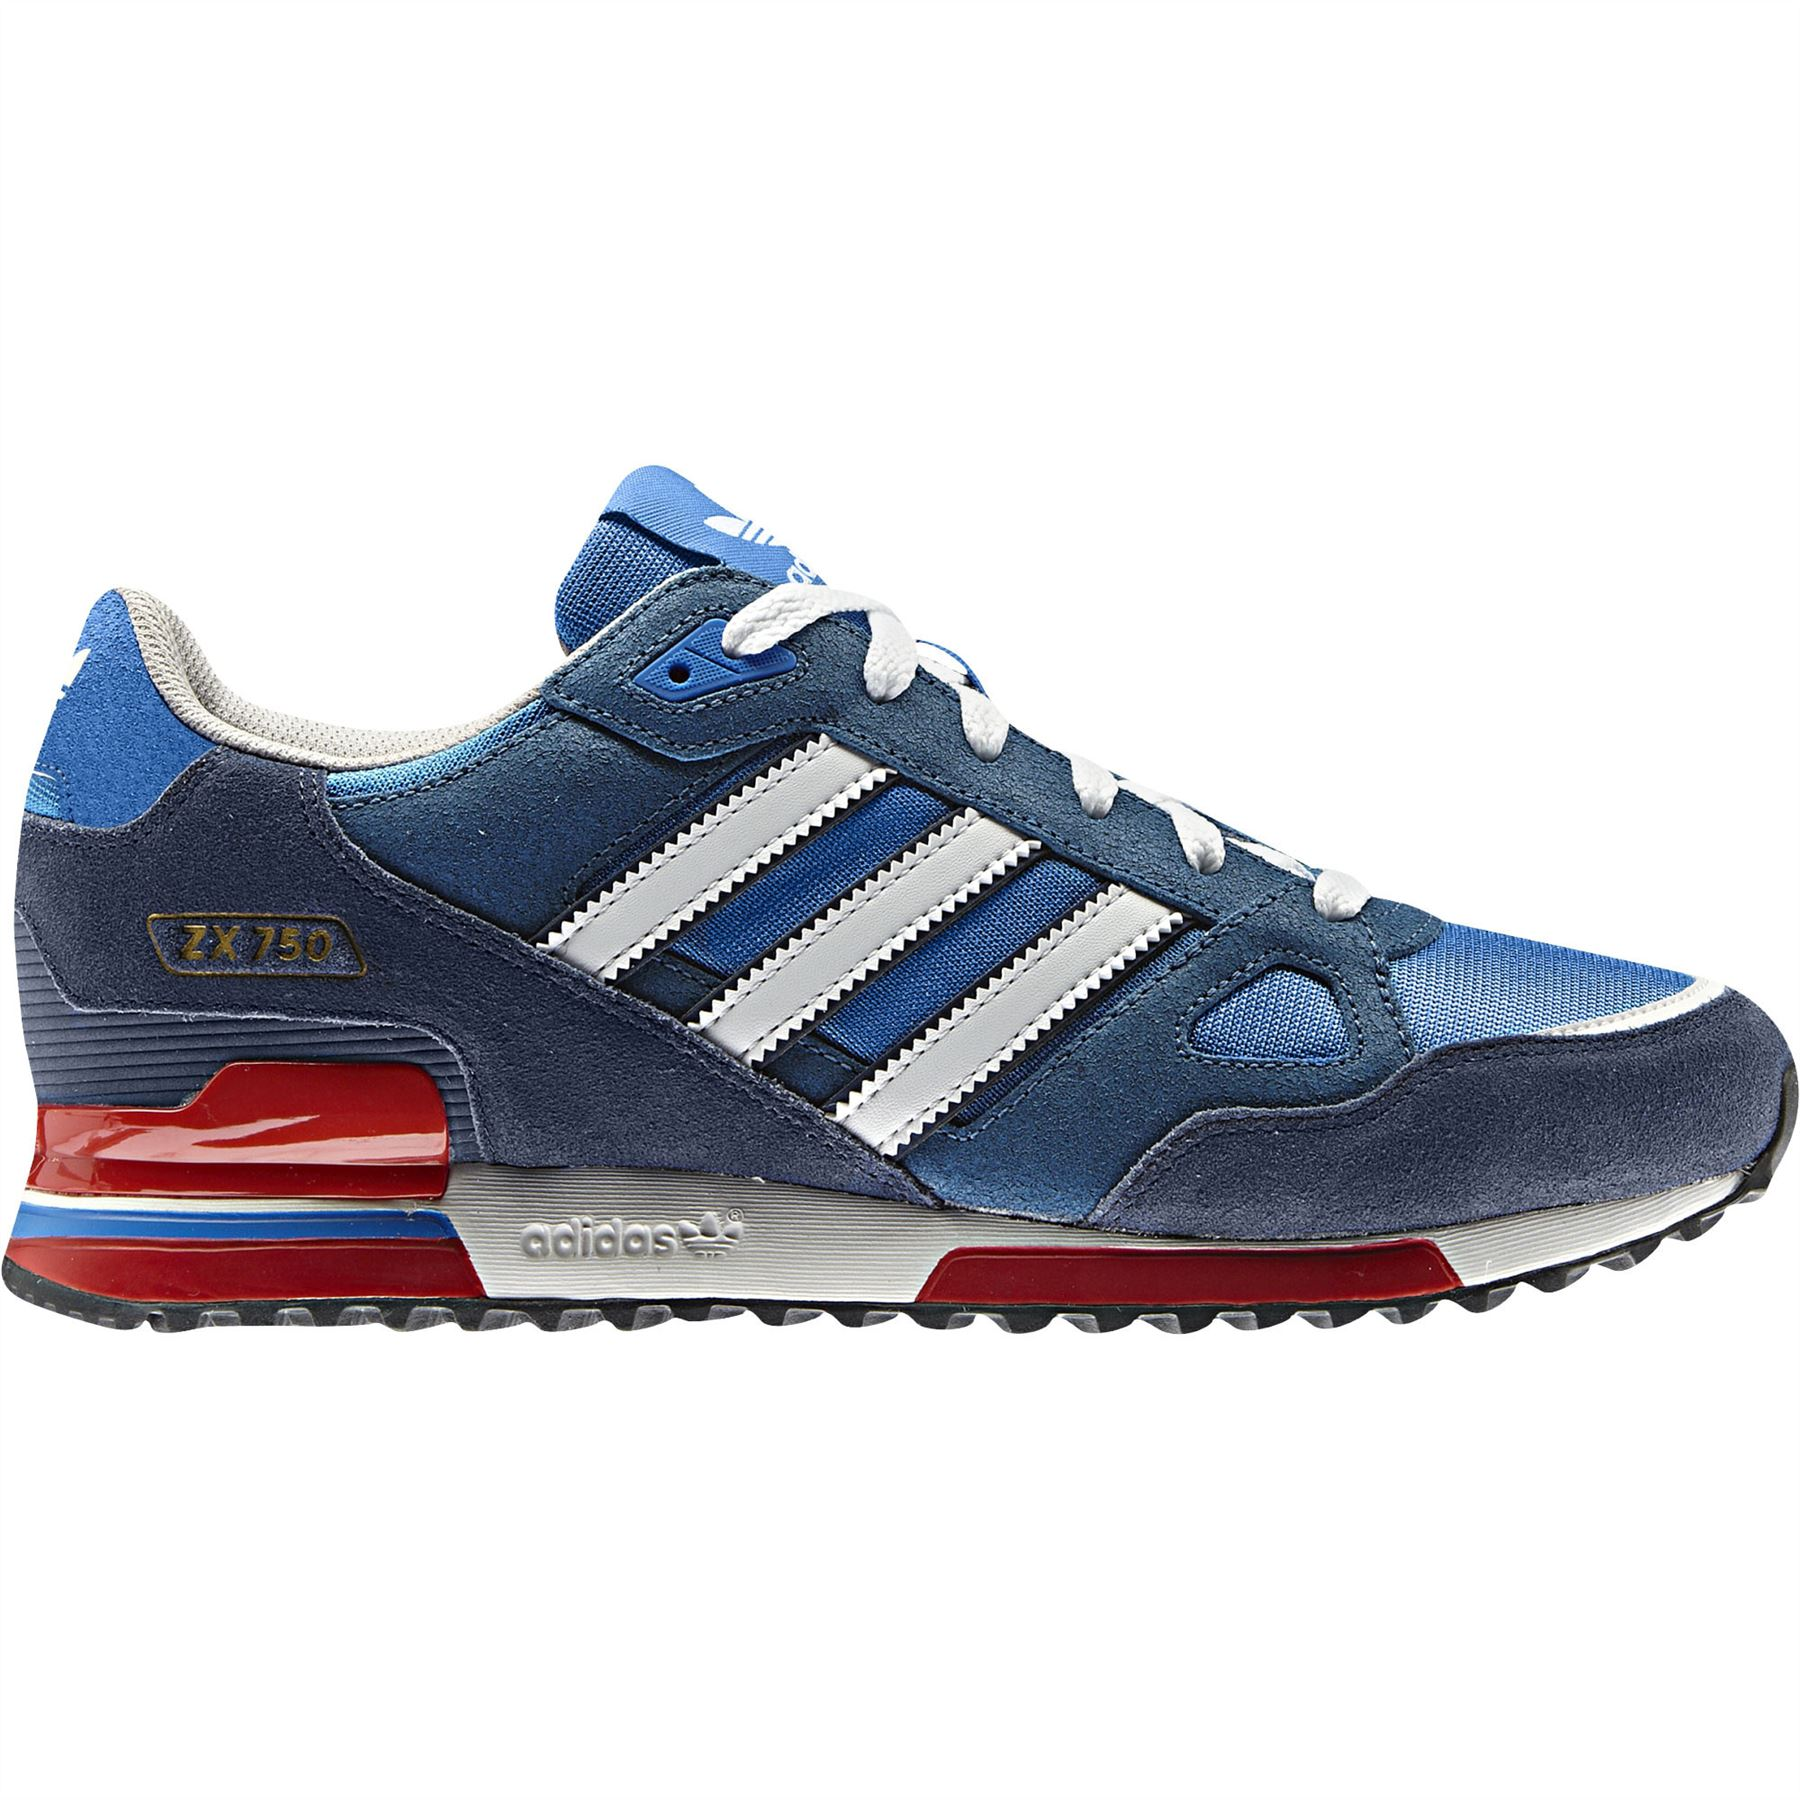 adidas zx 750 bianche rosse blu